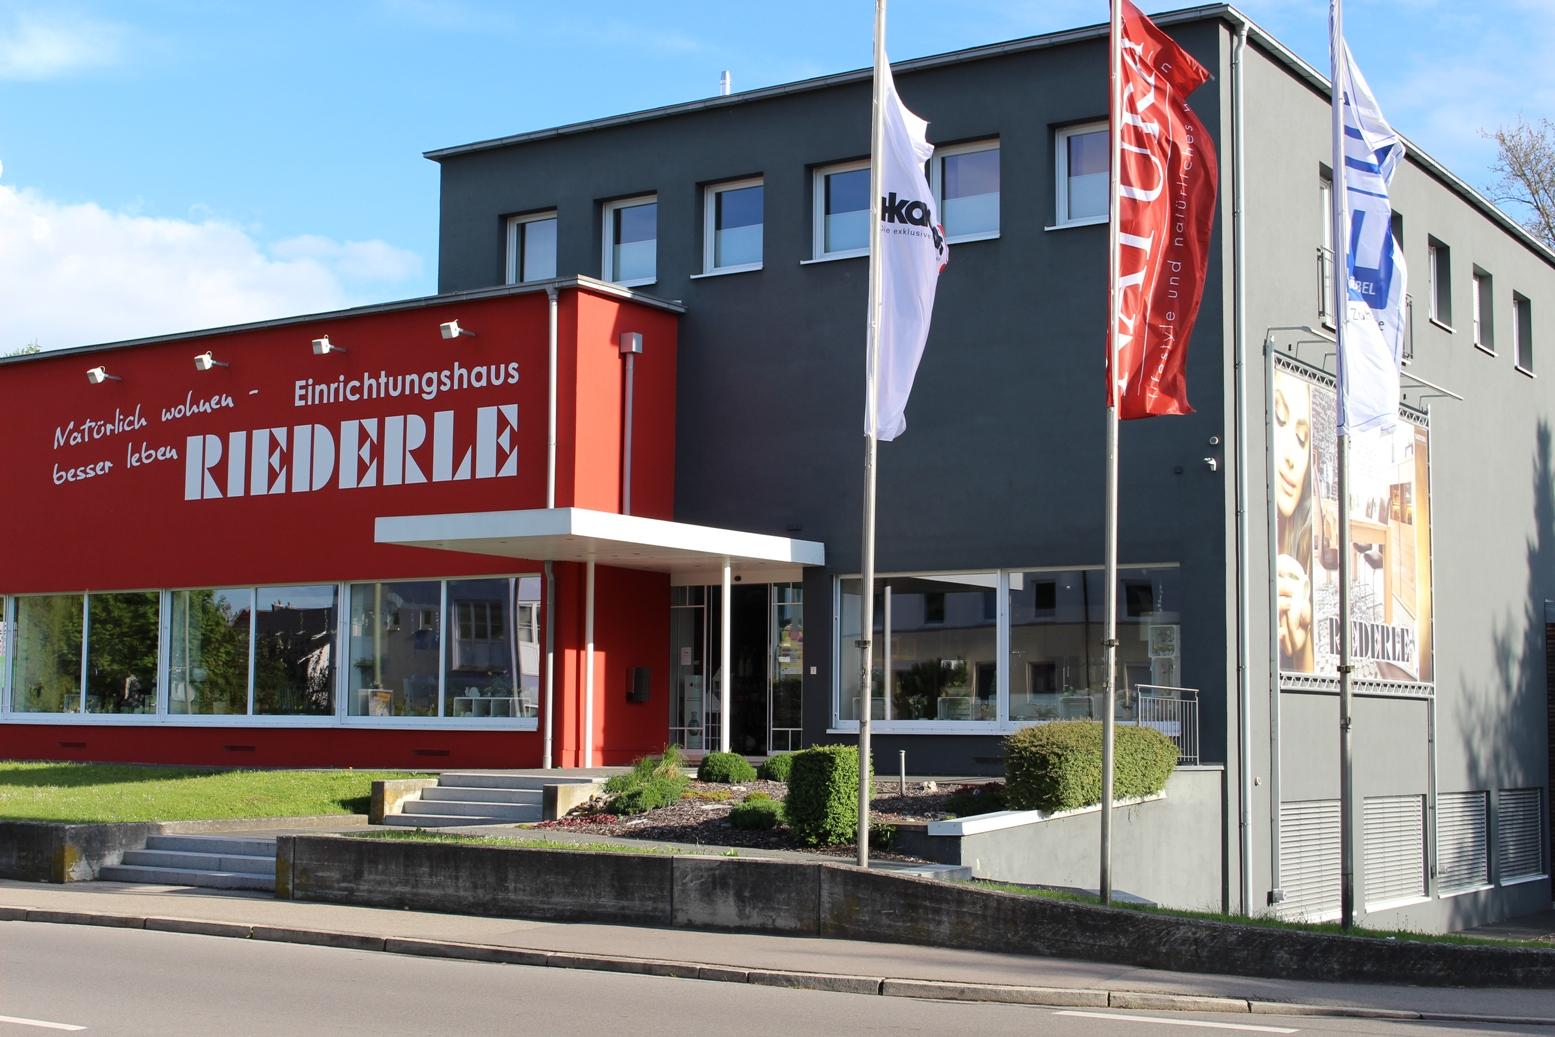 moebel-riederle-einrichtungshaus-ek-burgau banner